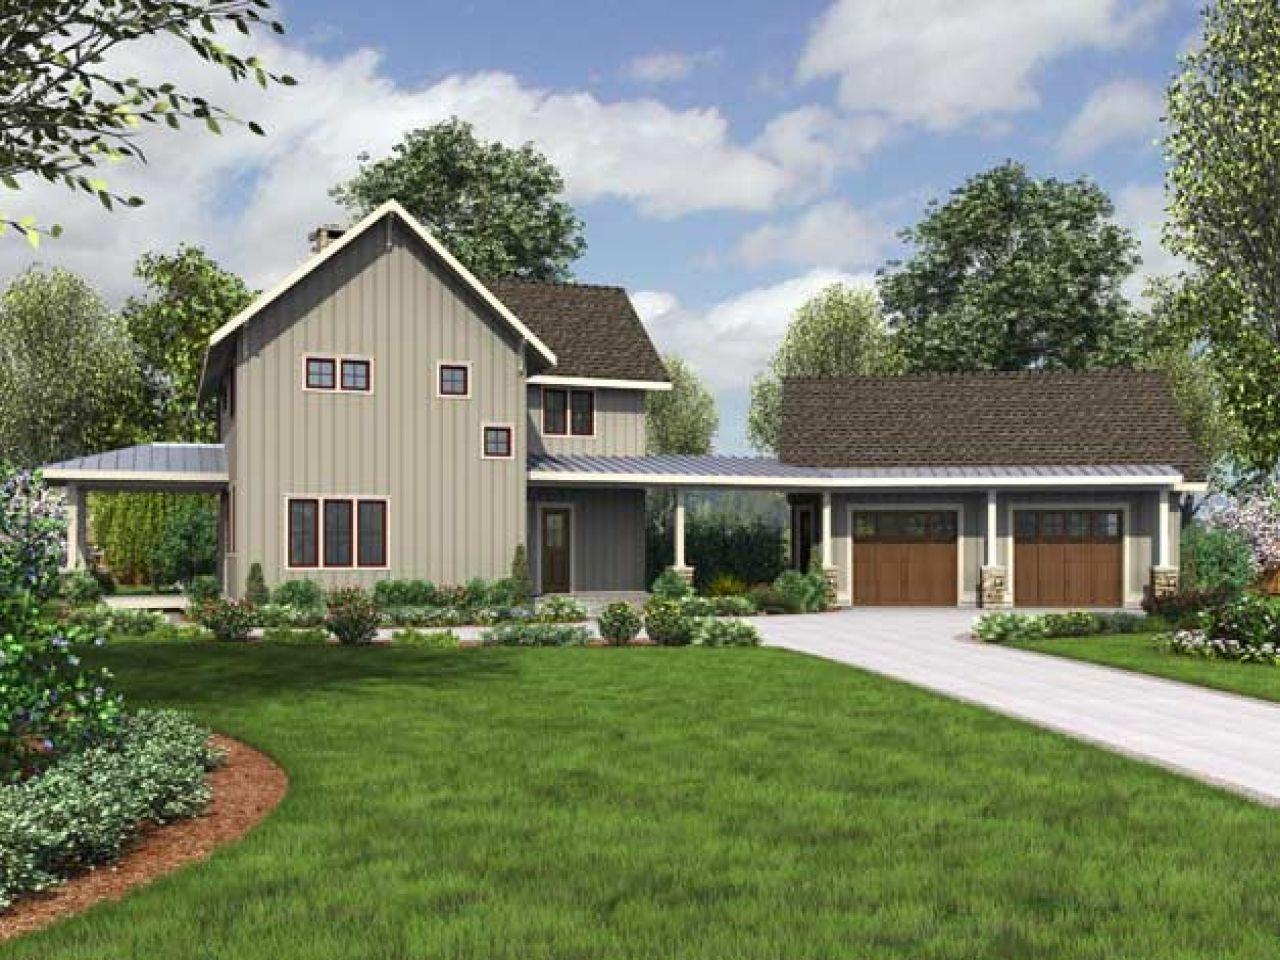 Image result for modern farmhouse house plan Modern